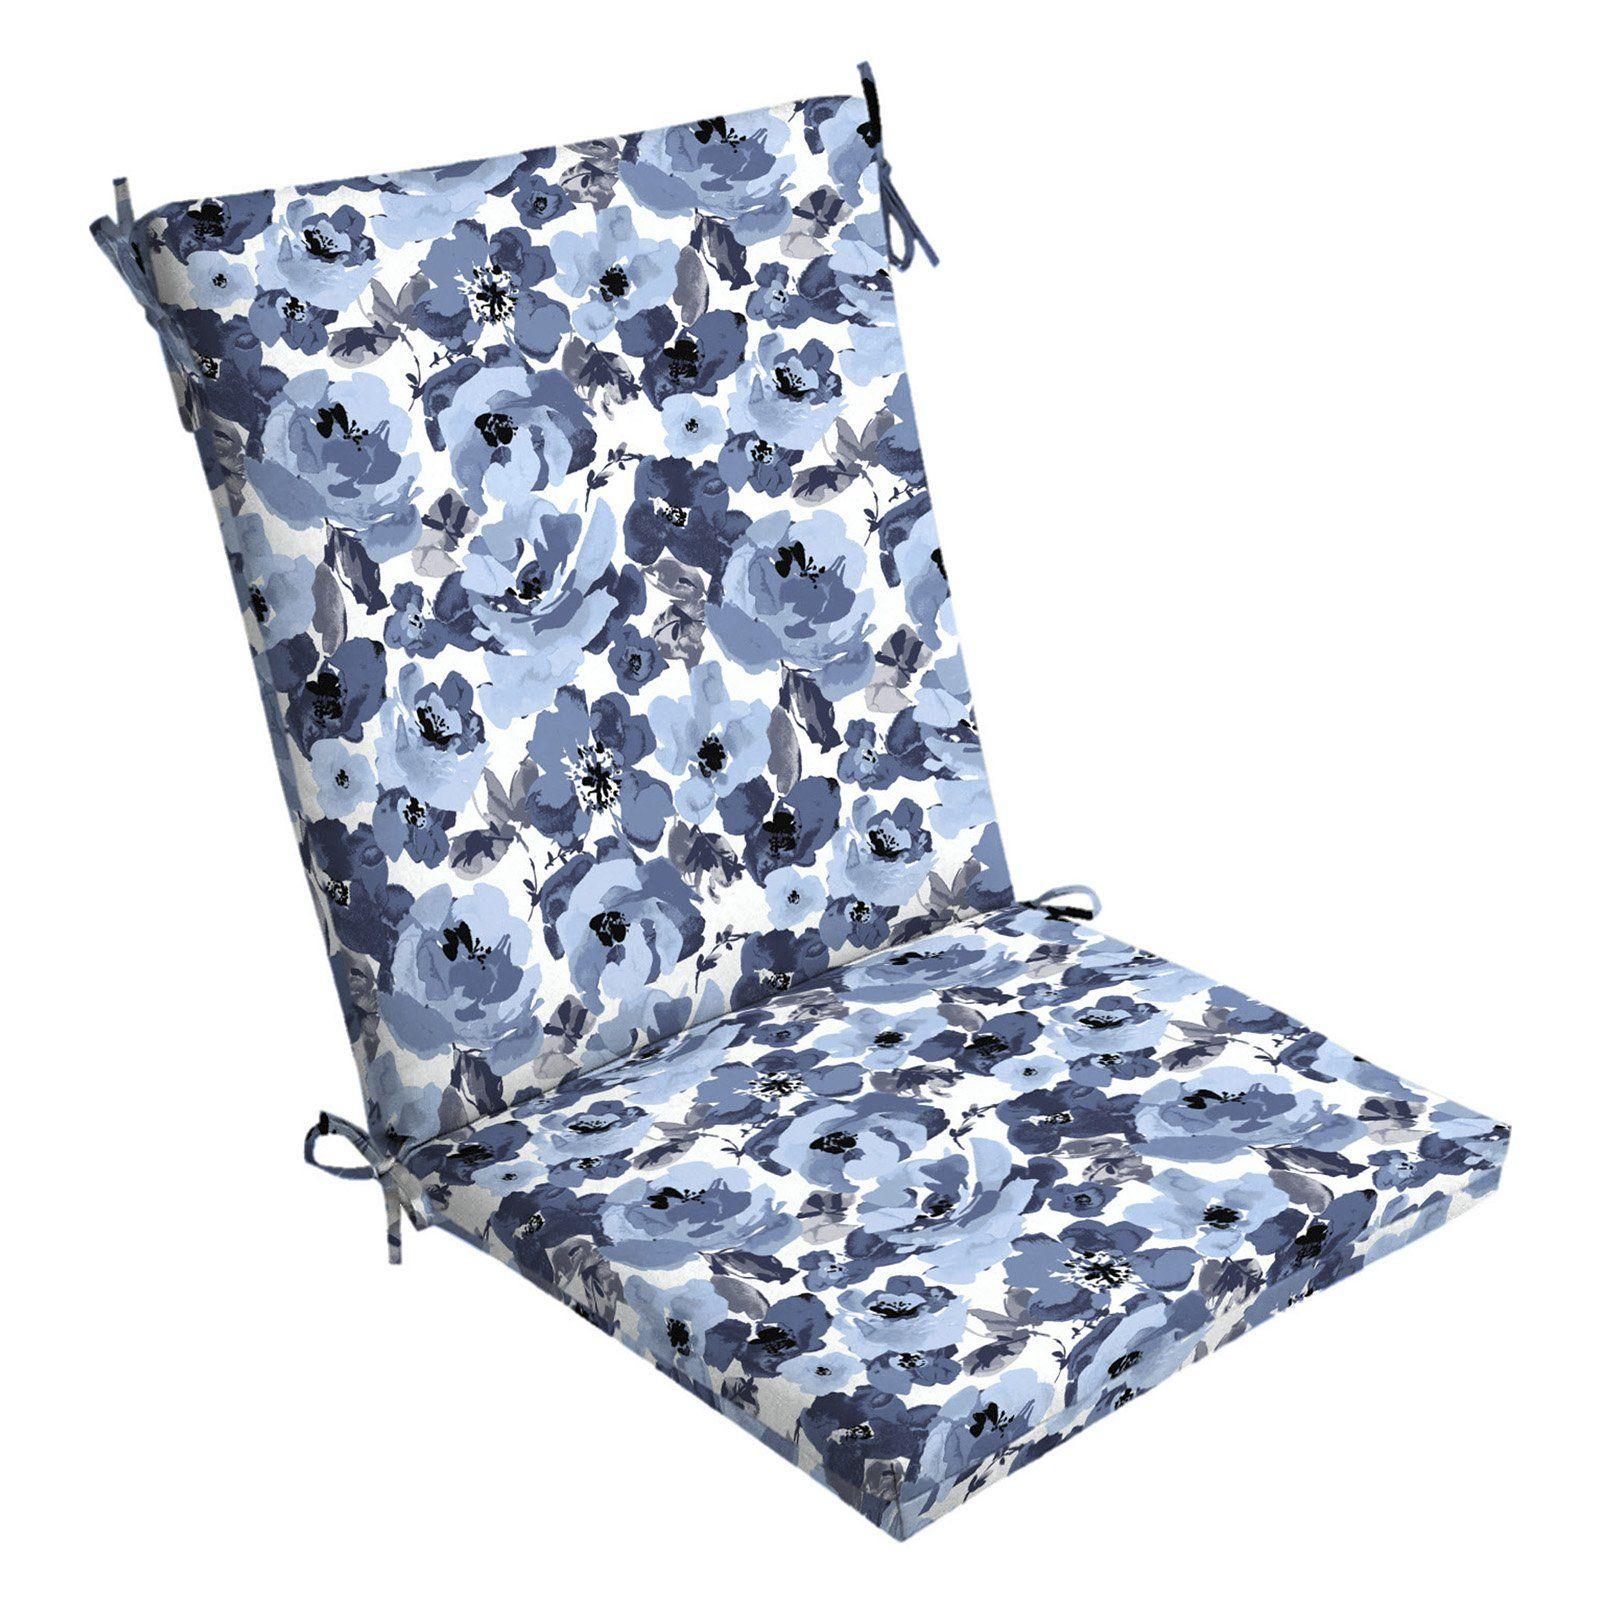 Arden Selections Leala Garden Delight Outdoor Chair Cushion In 2019